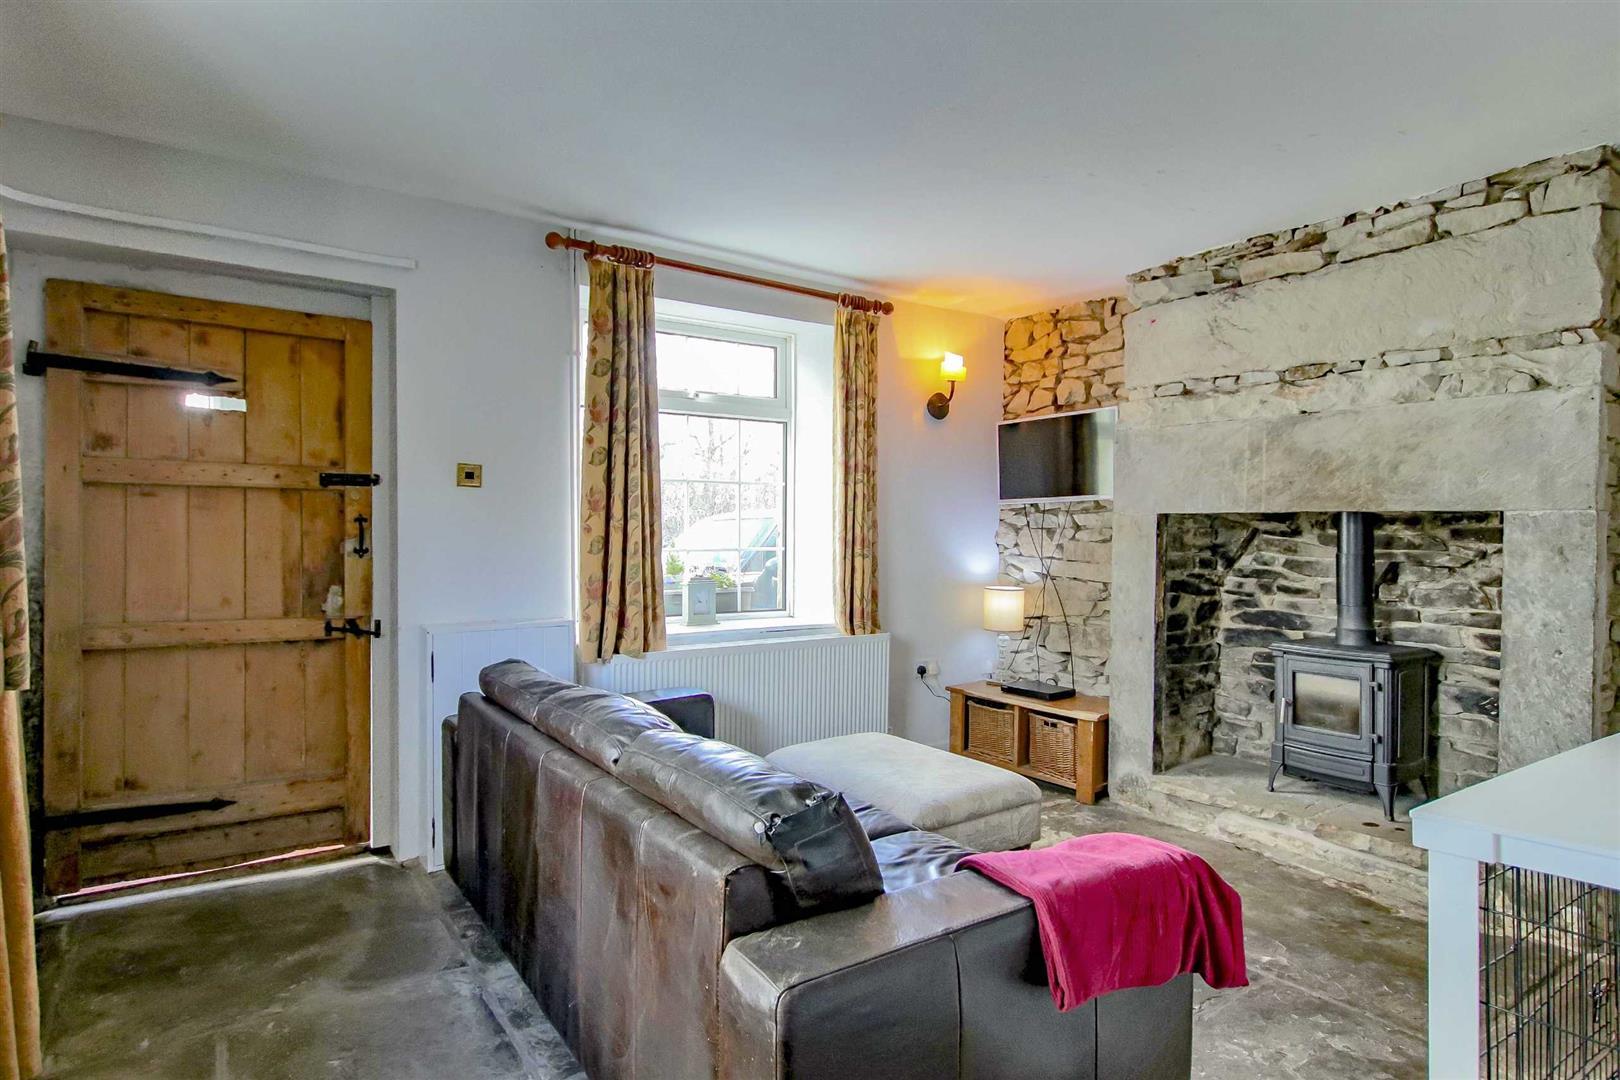 4 Bedroom Detached House For Sale - p033686_10.jpg